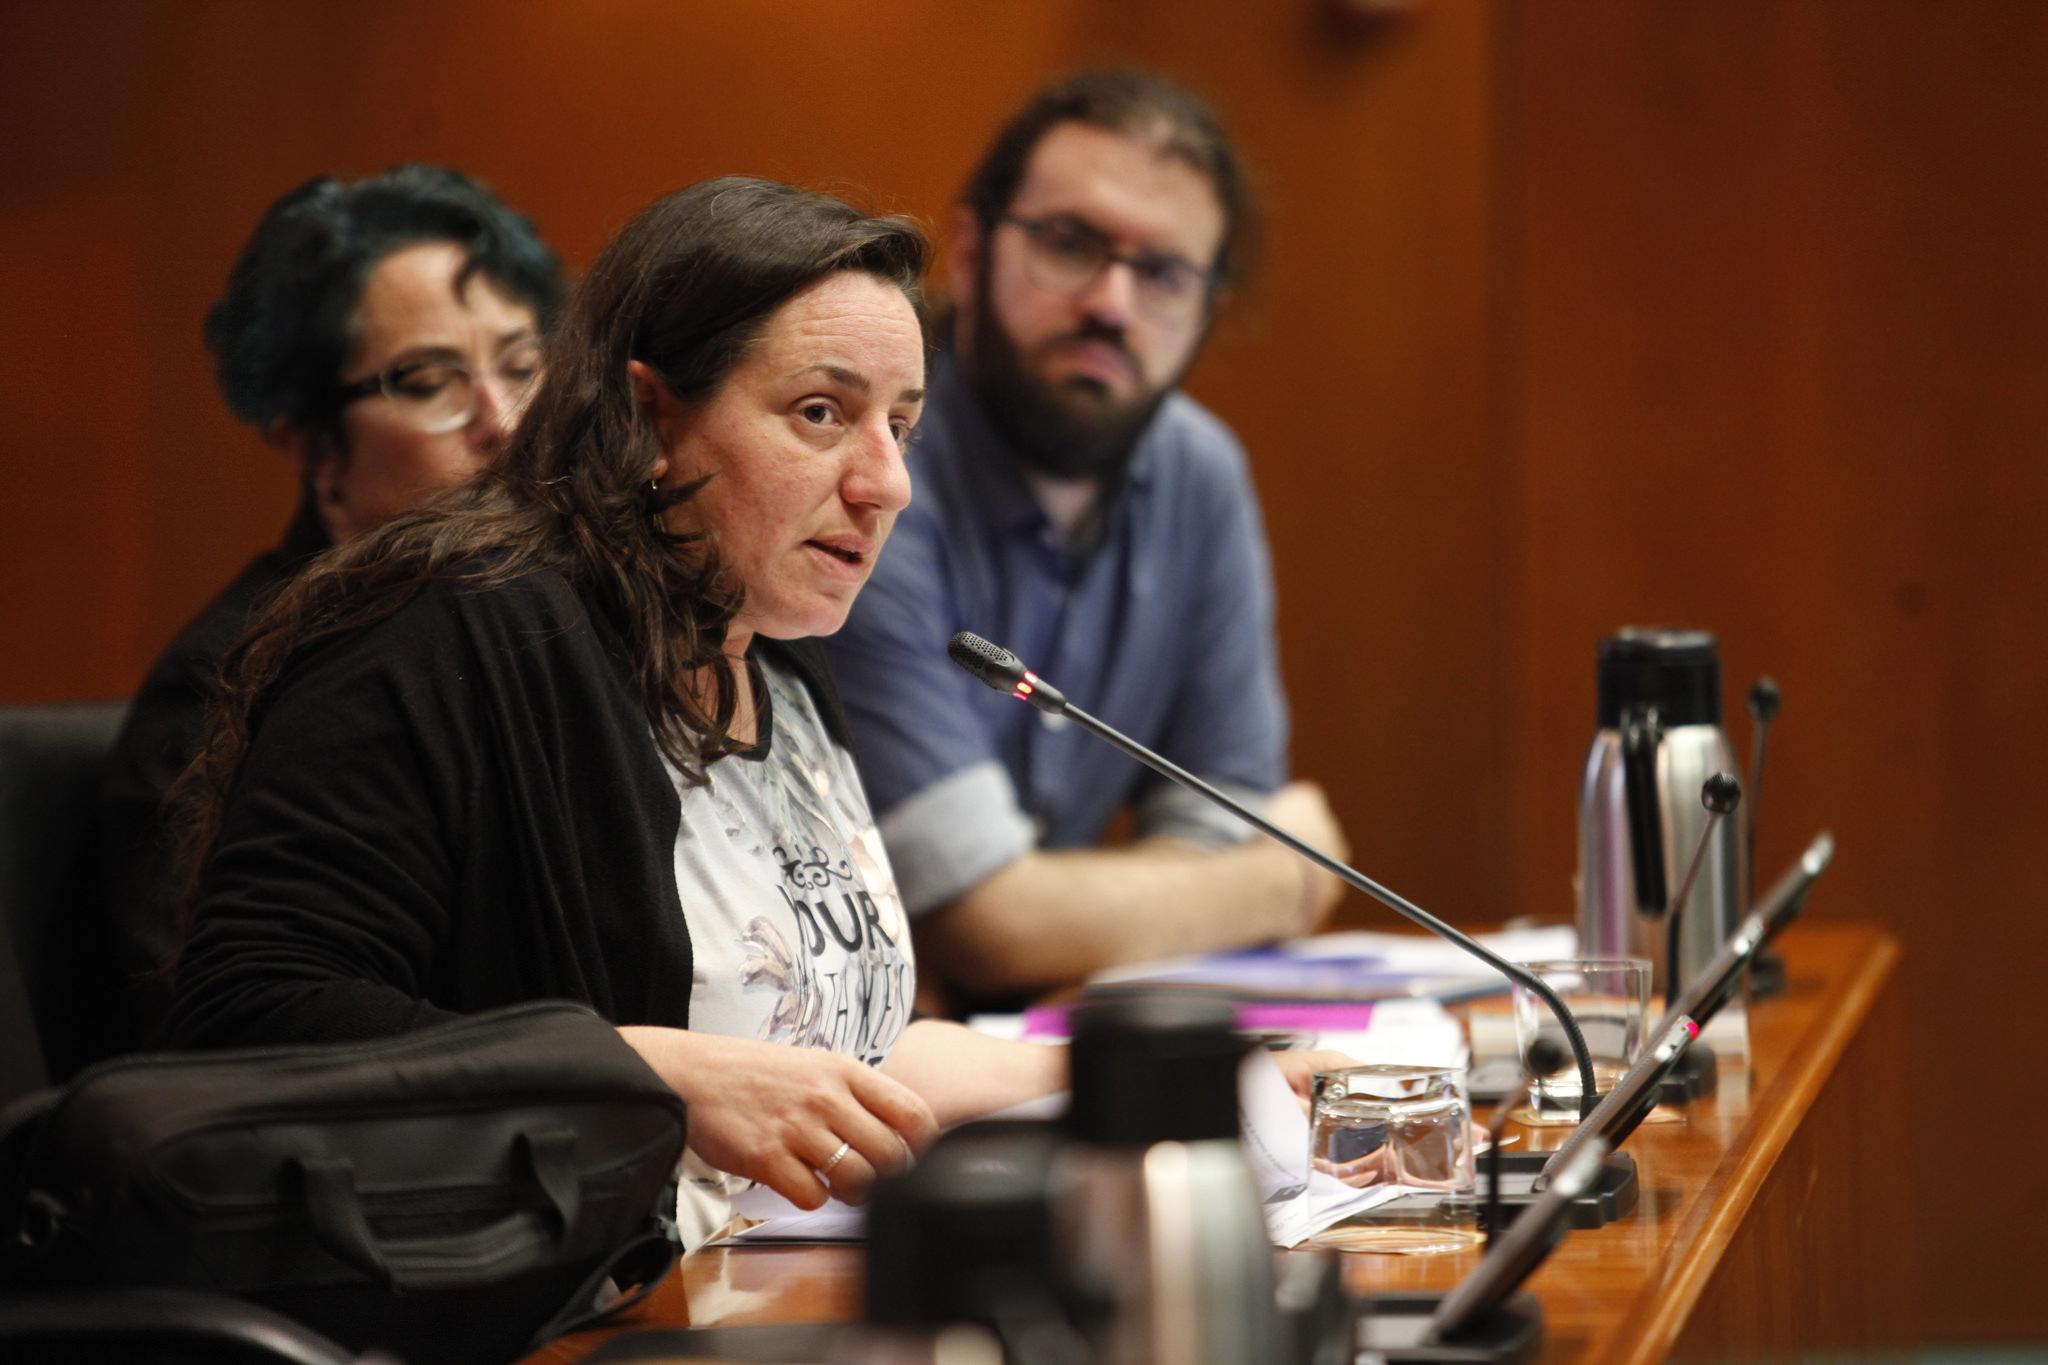 Marta de Santos - Podemos Aragon